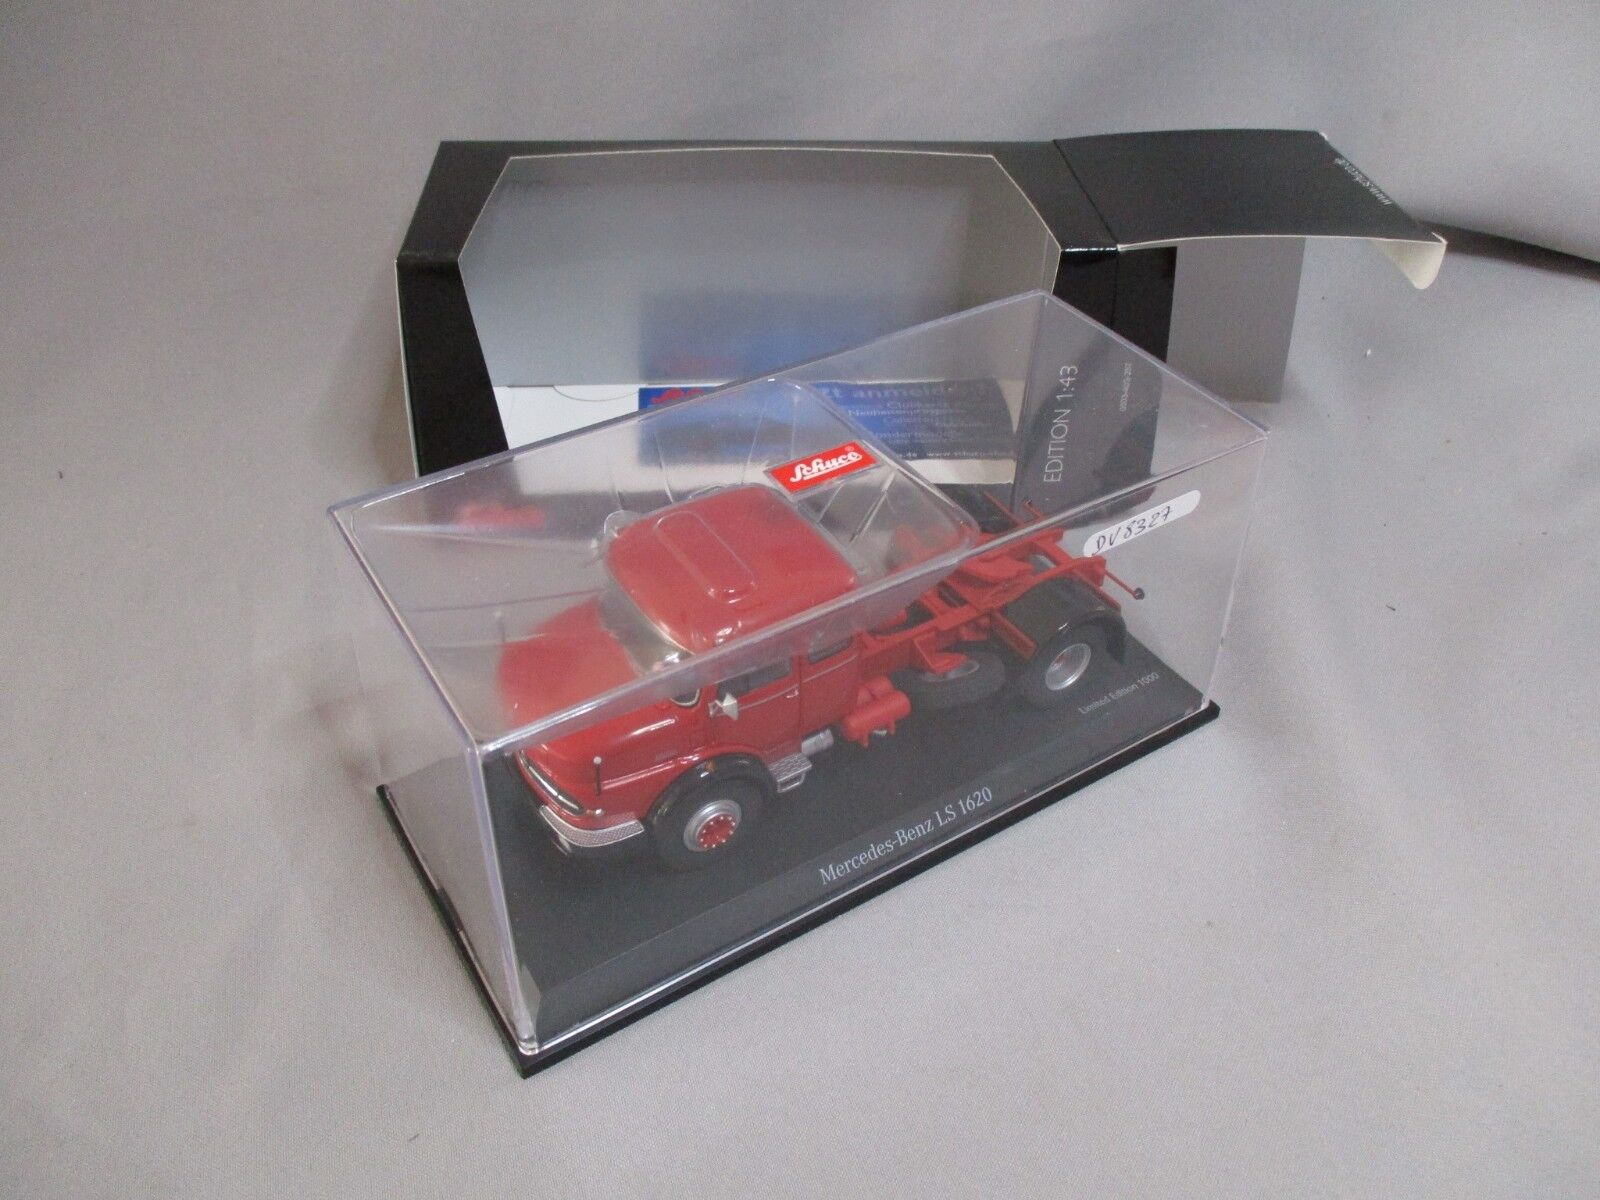 DV8327 SCHUCO 1 43 MERCEDES BENZ LS LS LS 1620 rouge Ref 450359800 LIMITED 1000 PIECES 36d085